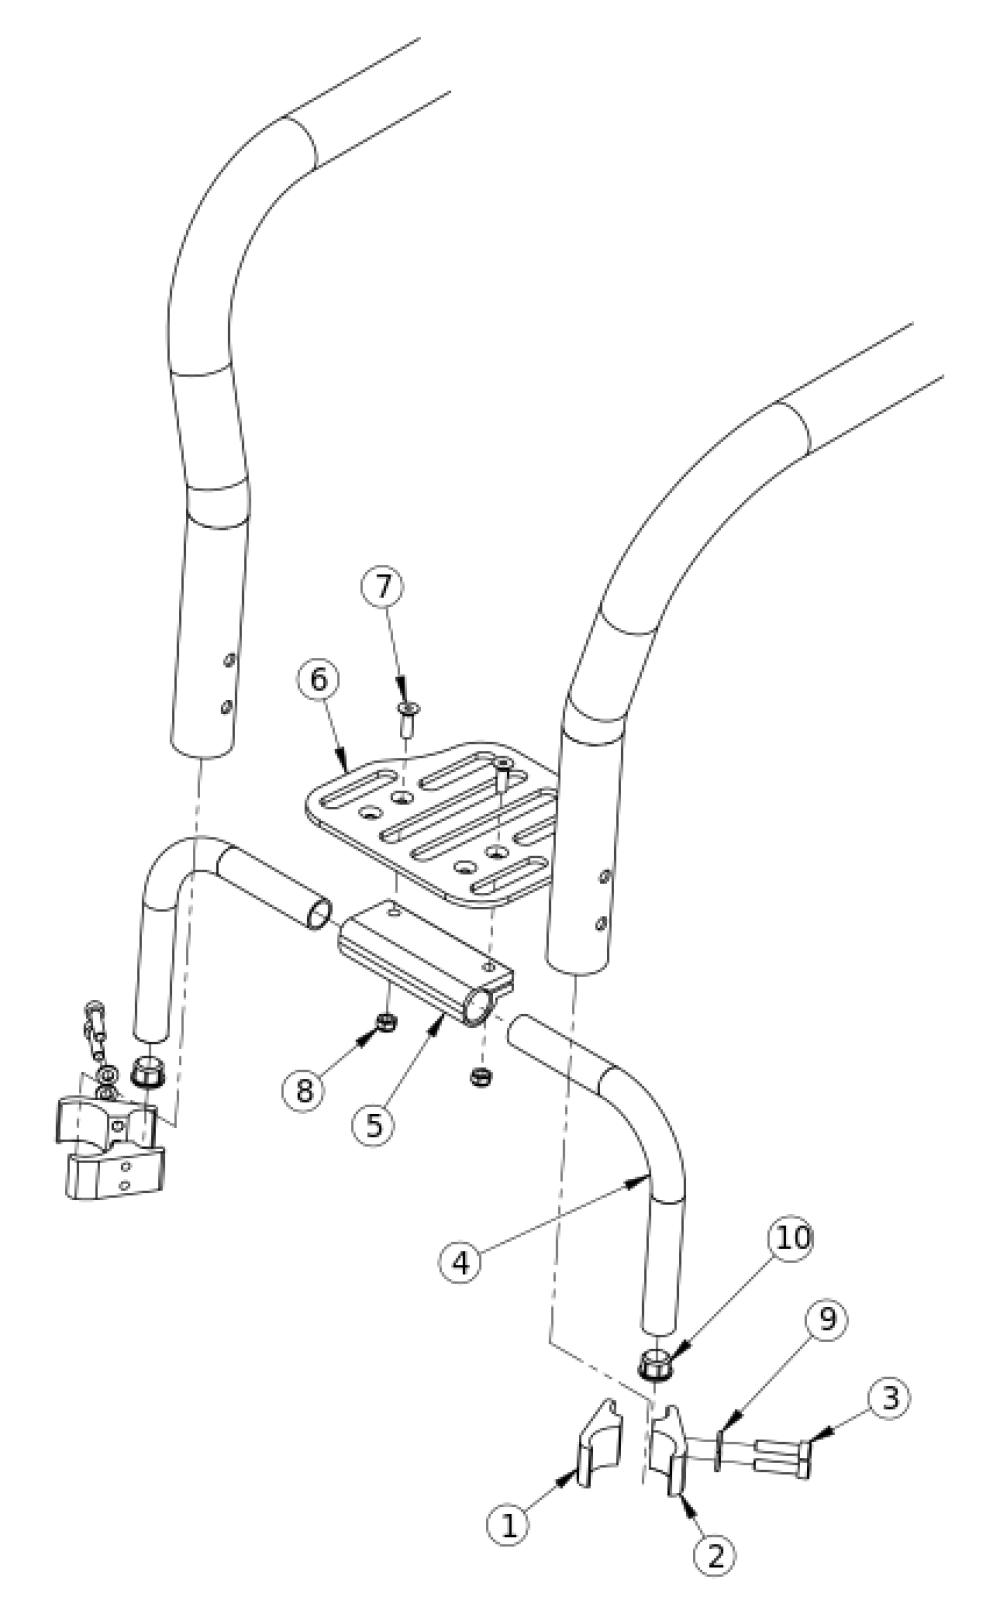 (discontinued) Rigid High Mount Angle Adjustable Footrest 15